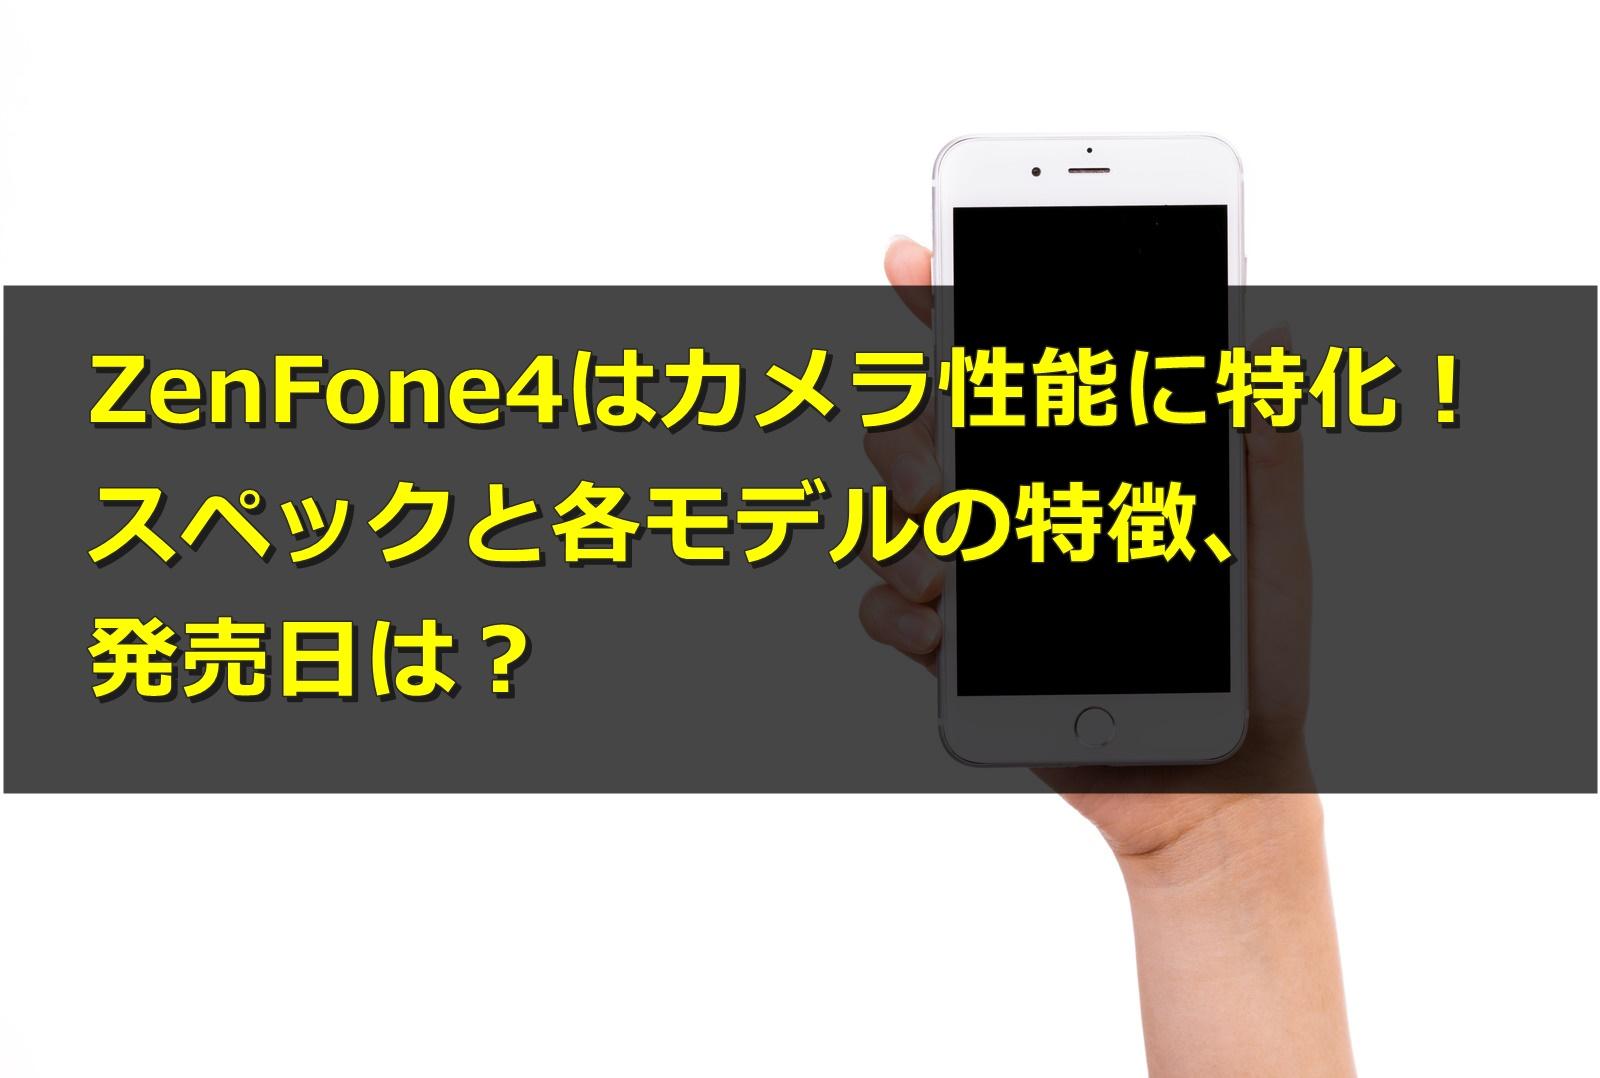 ZenFone4はカメラ性能に特化!スペックと各モデルの特徴、発売日は?